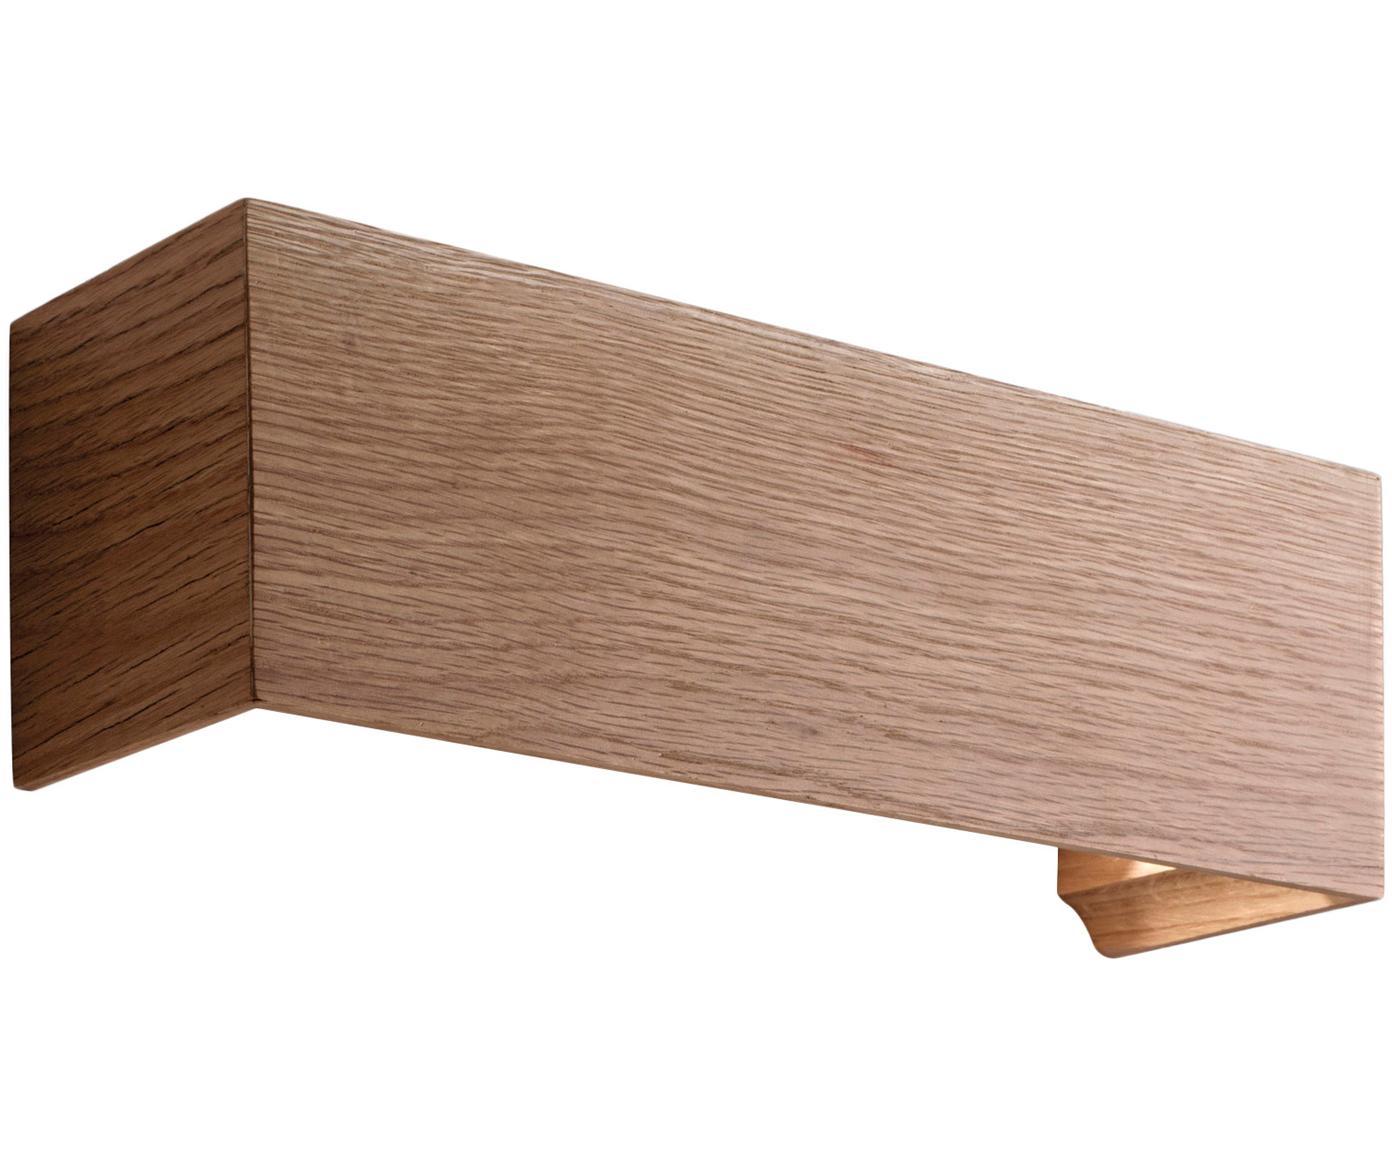 Aplique Badia, Fijación: roble, Roble, An 38 x Al 12 cm